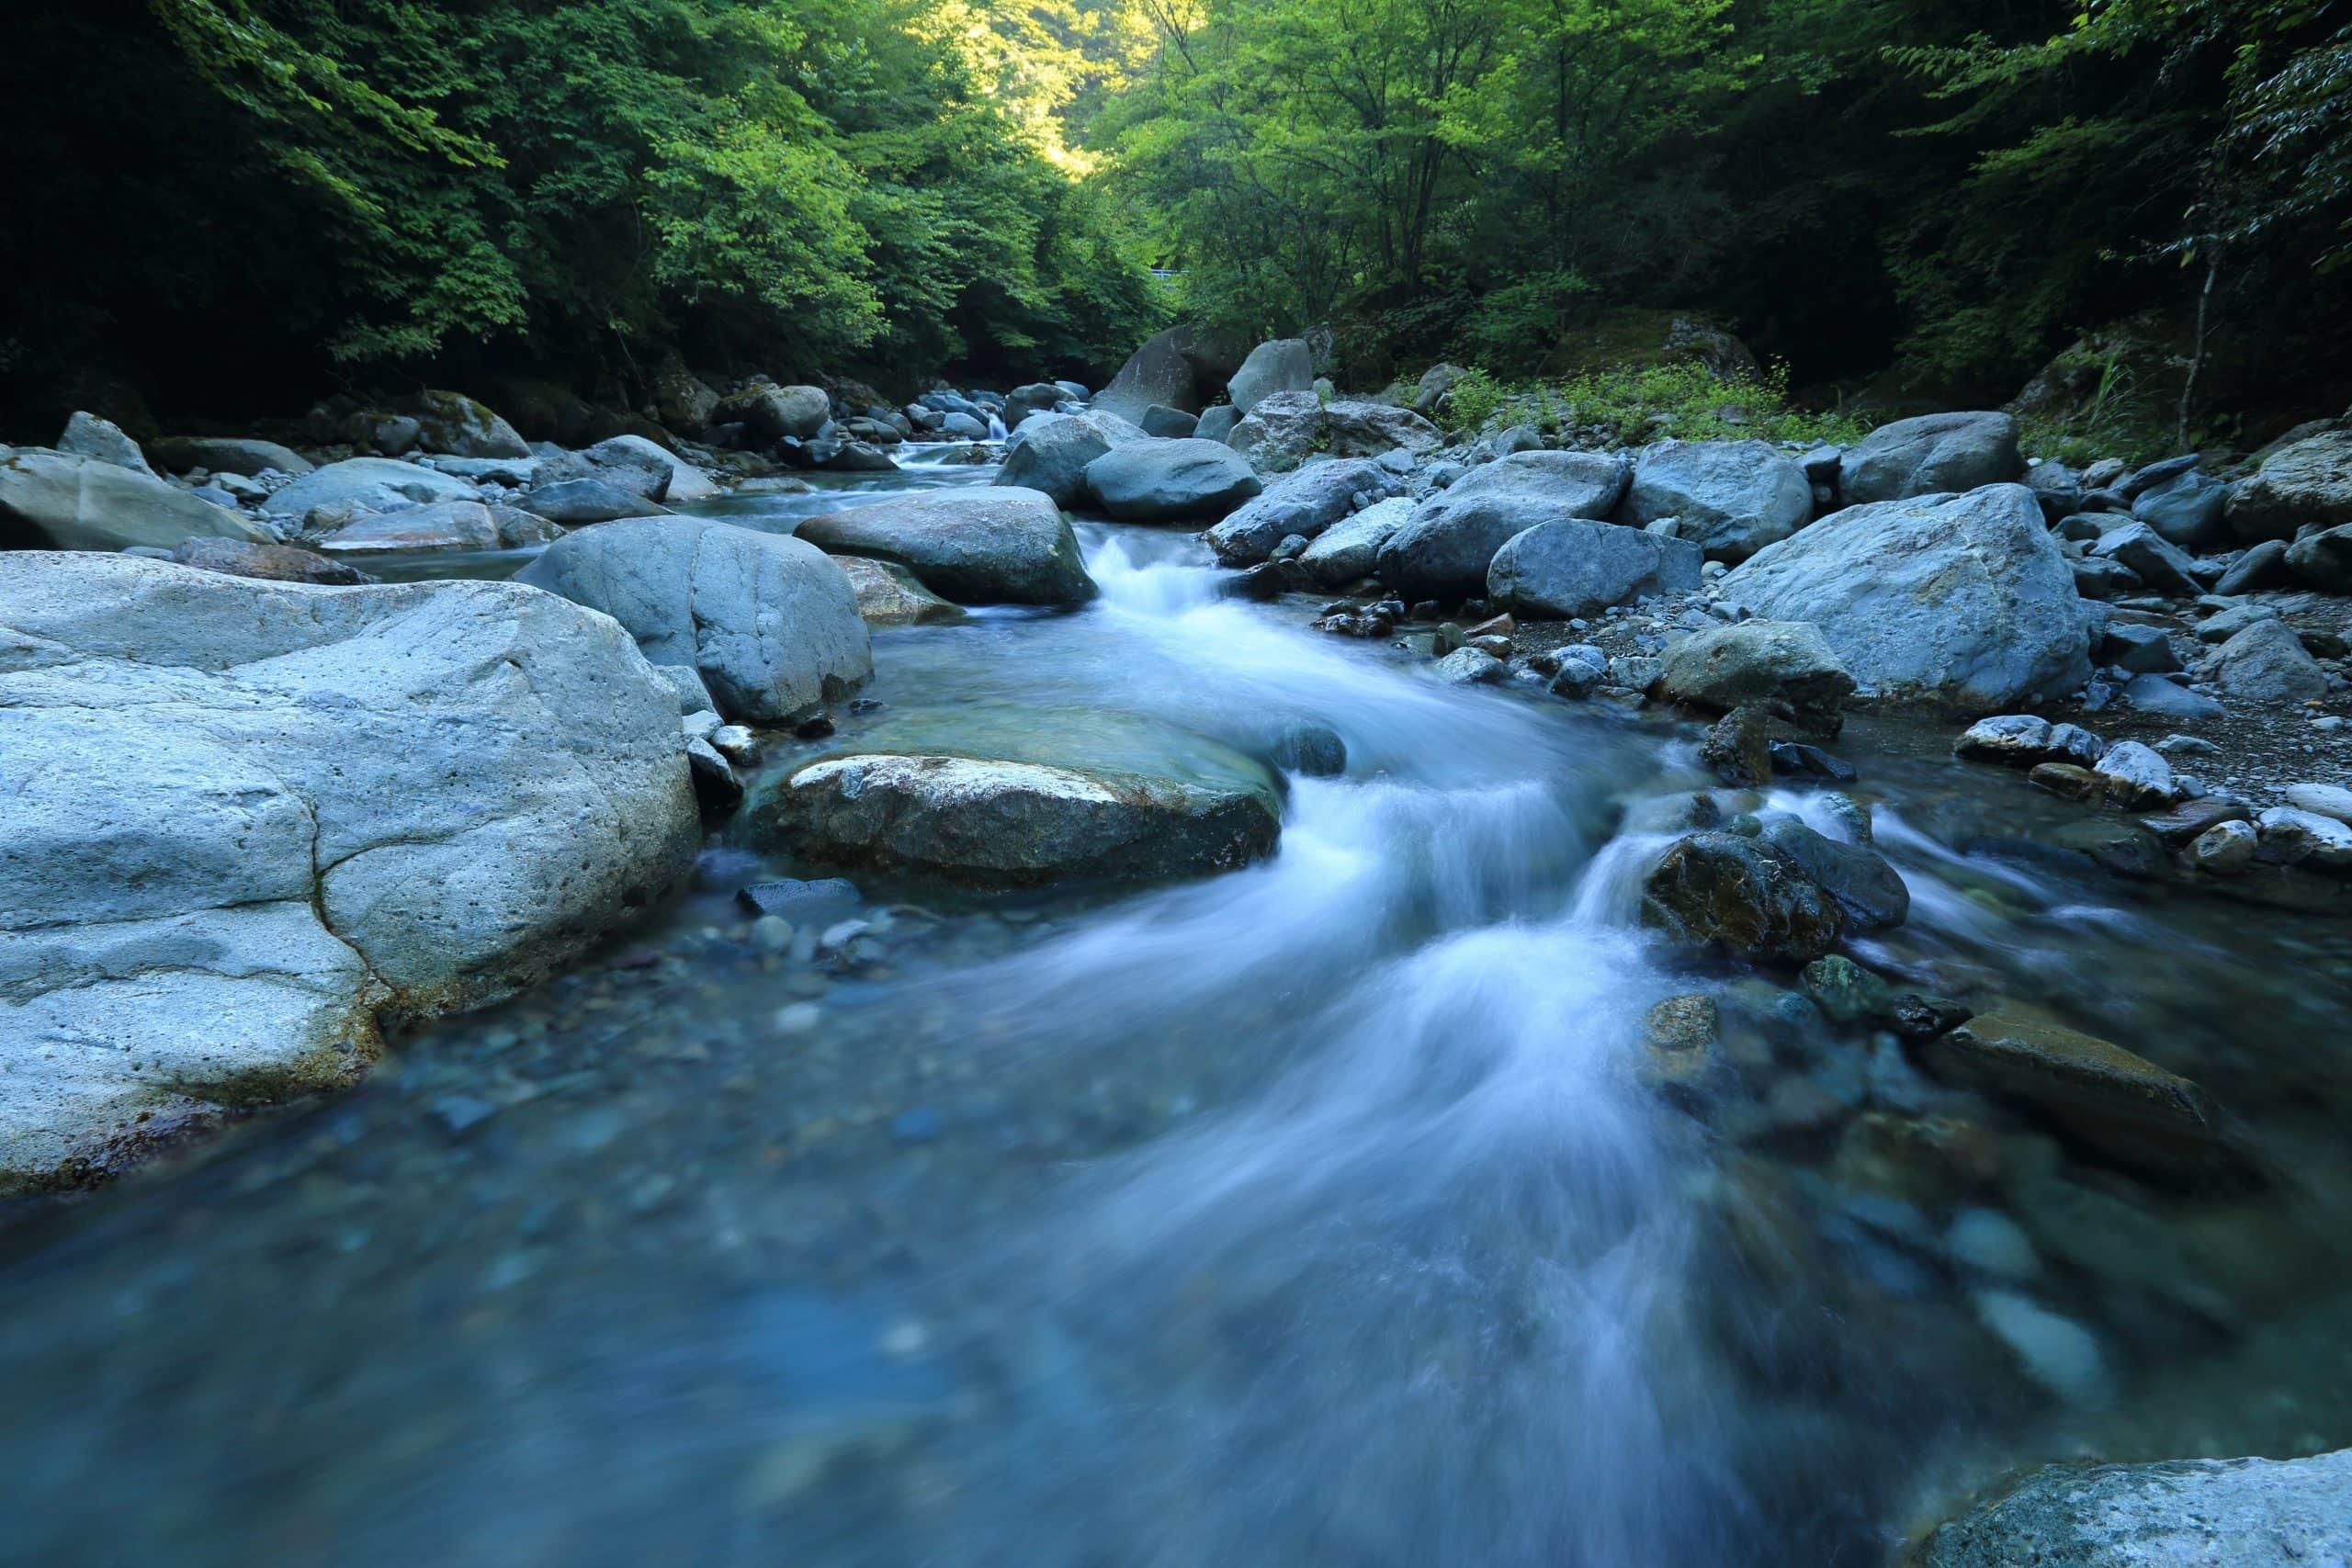 Bakes Spring/River, things to do in La Union, La Union tourist spots